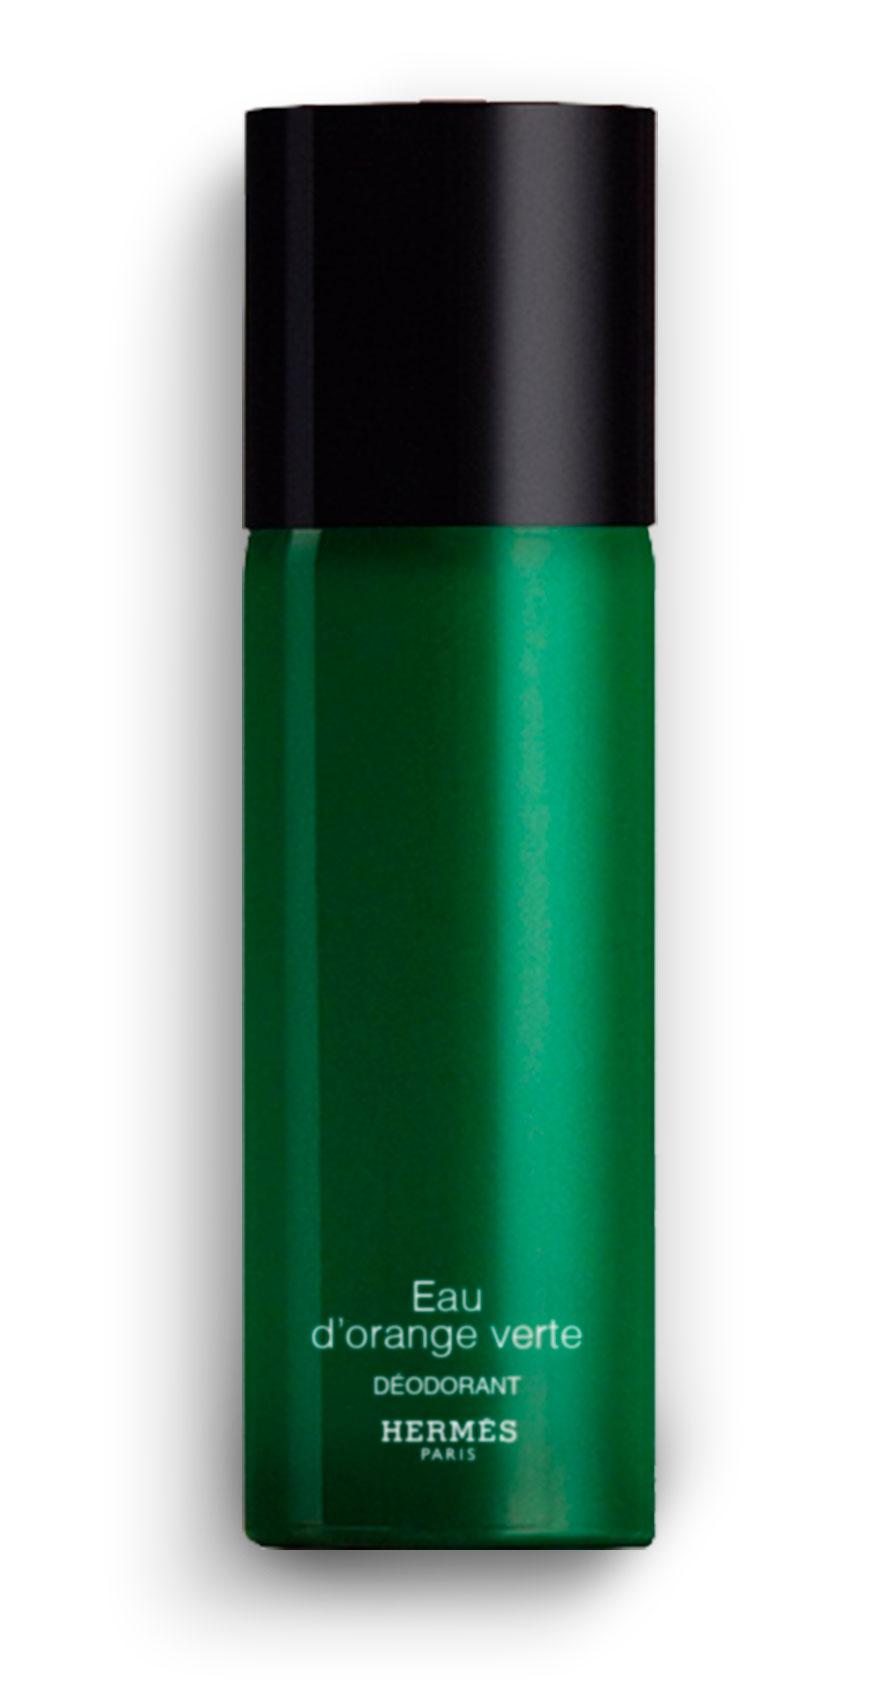 Hermès - Eau d'orange verte - Déodorant spray